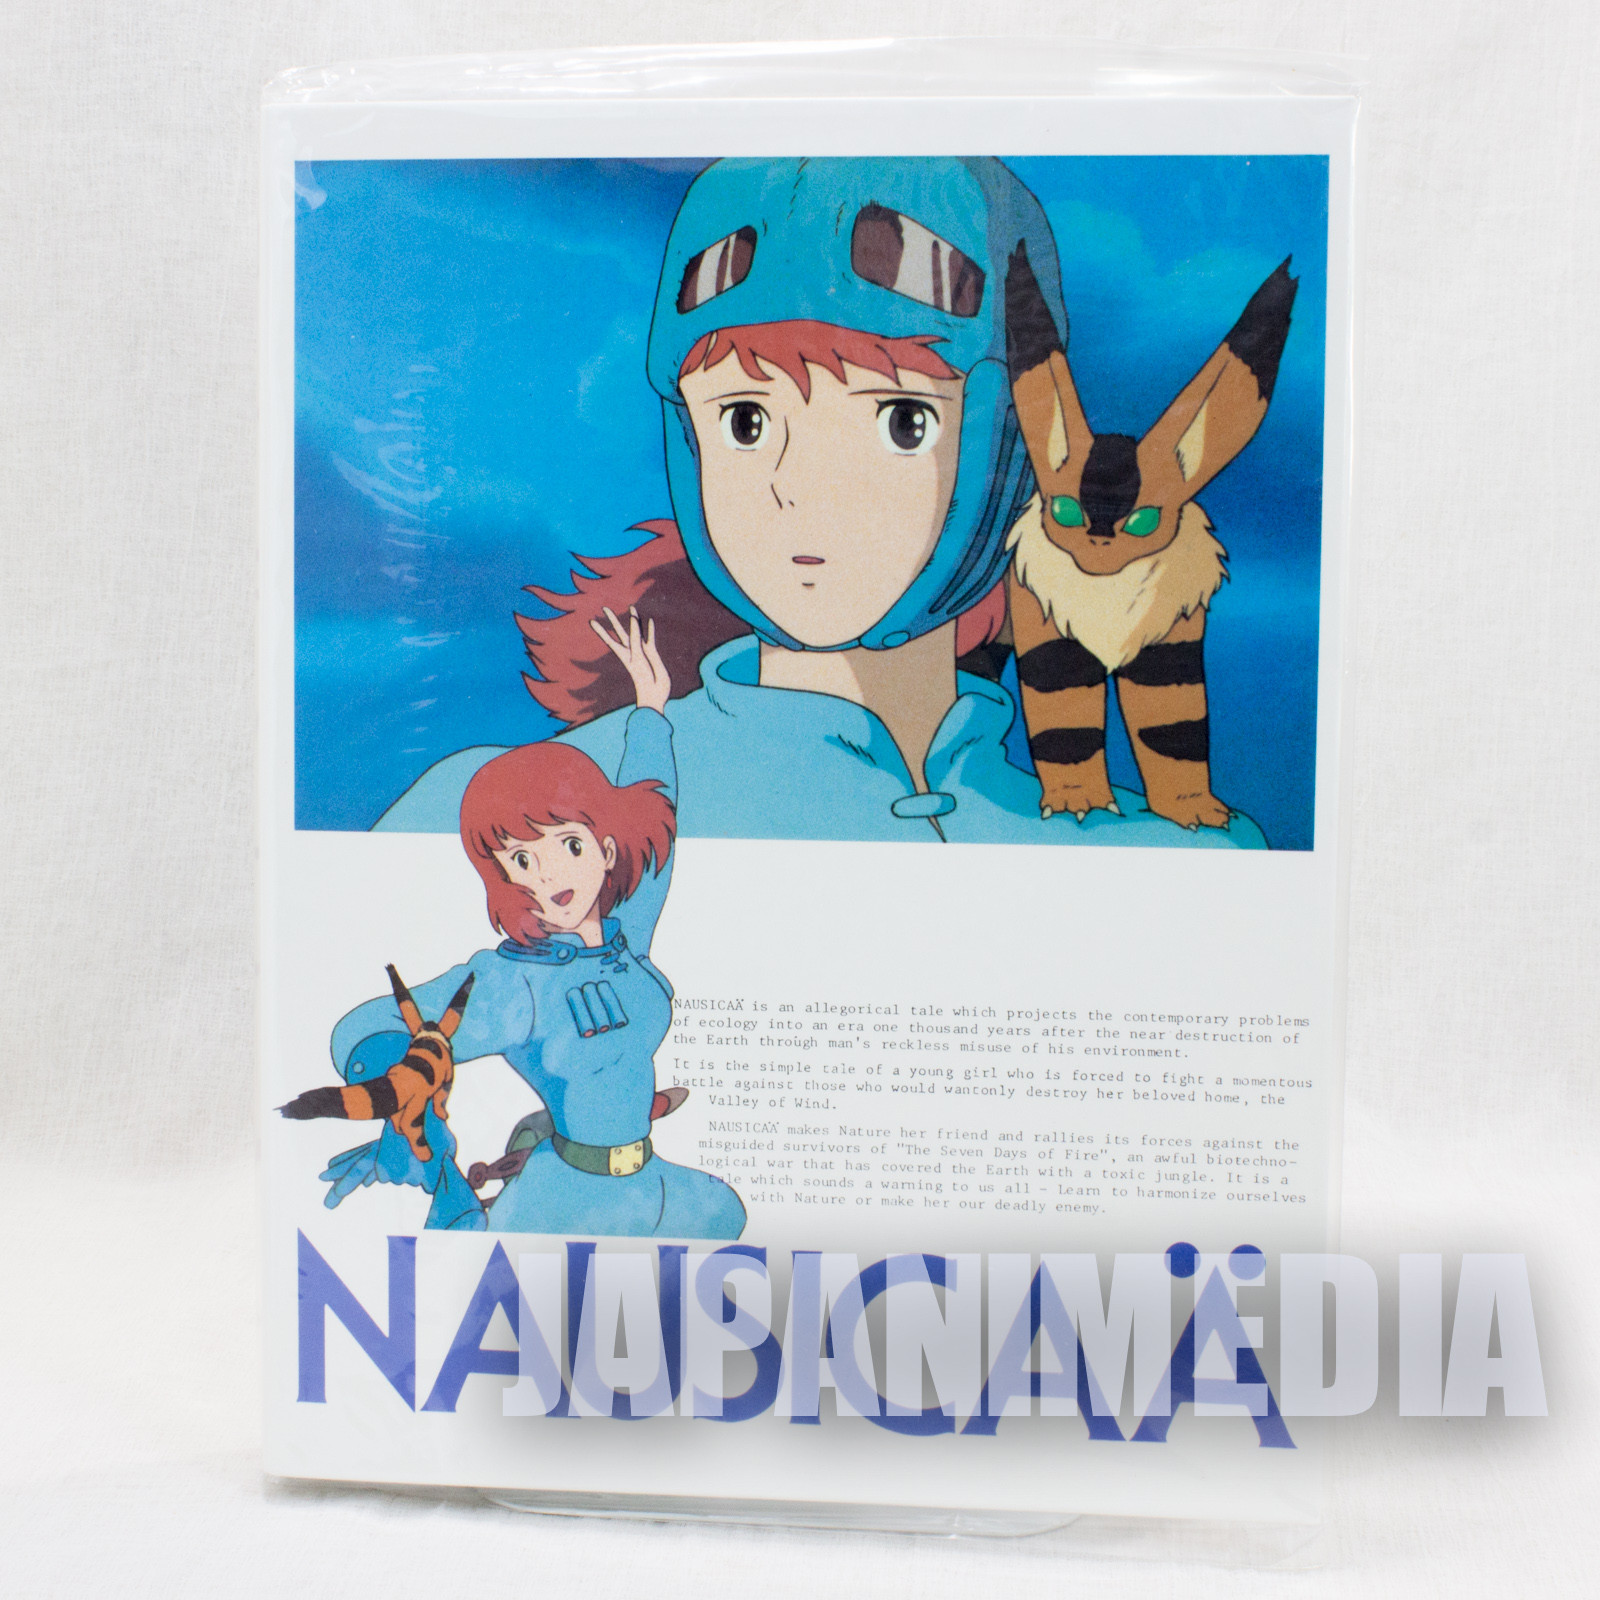 Retro RARE Nausicaa of the Valley Binder for B5 Loose-leaf Tokuma Shoten Ghibli2